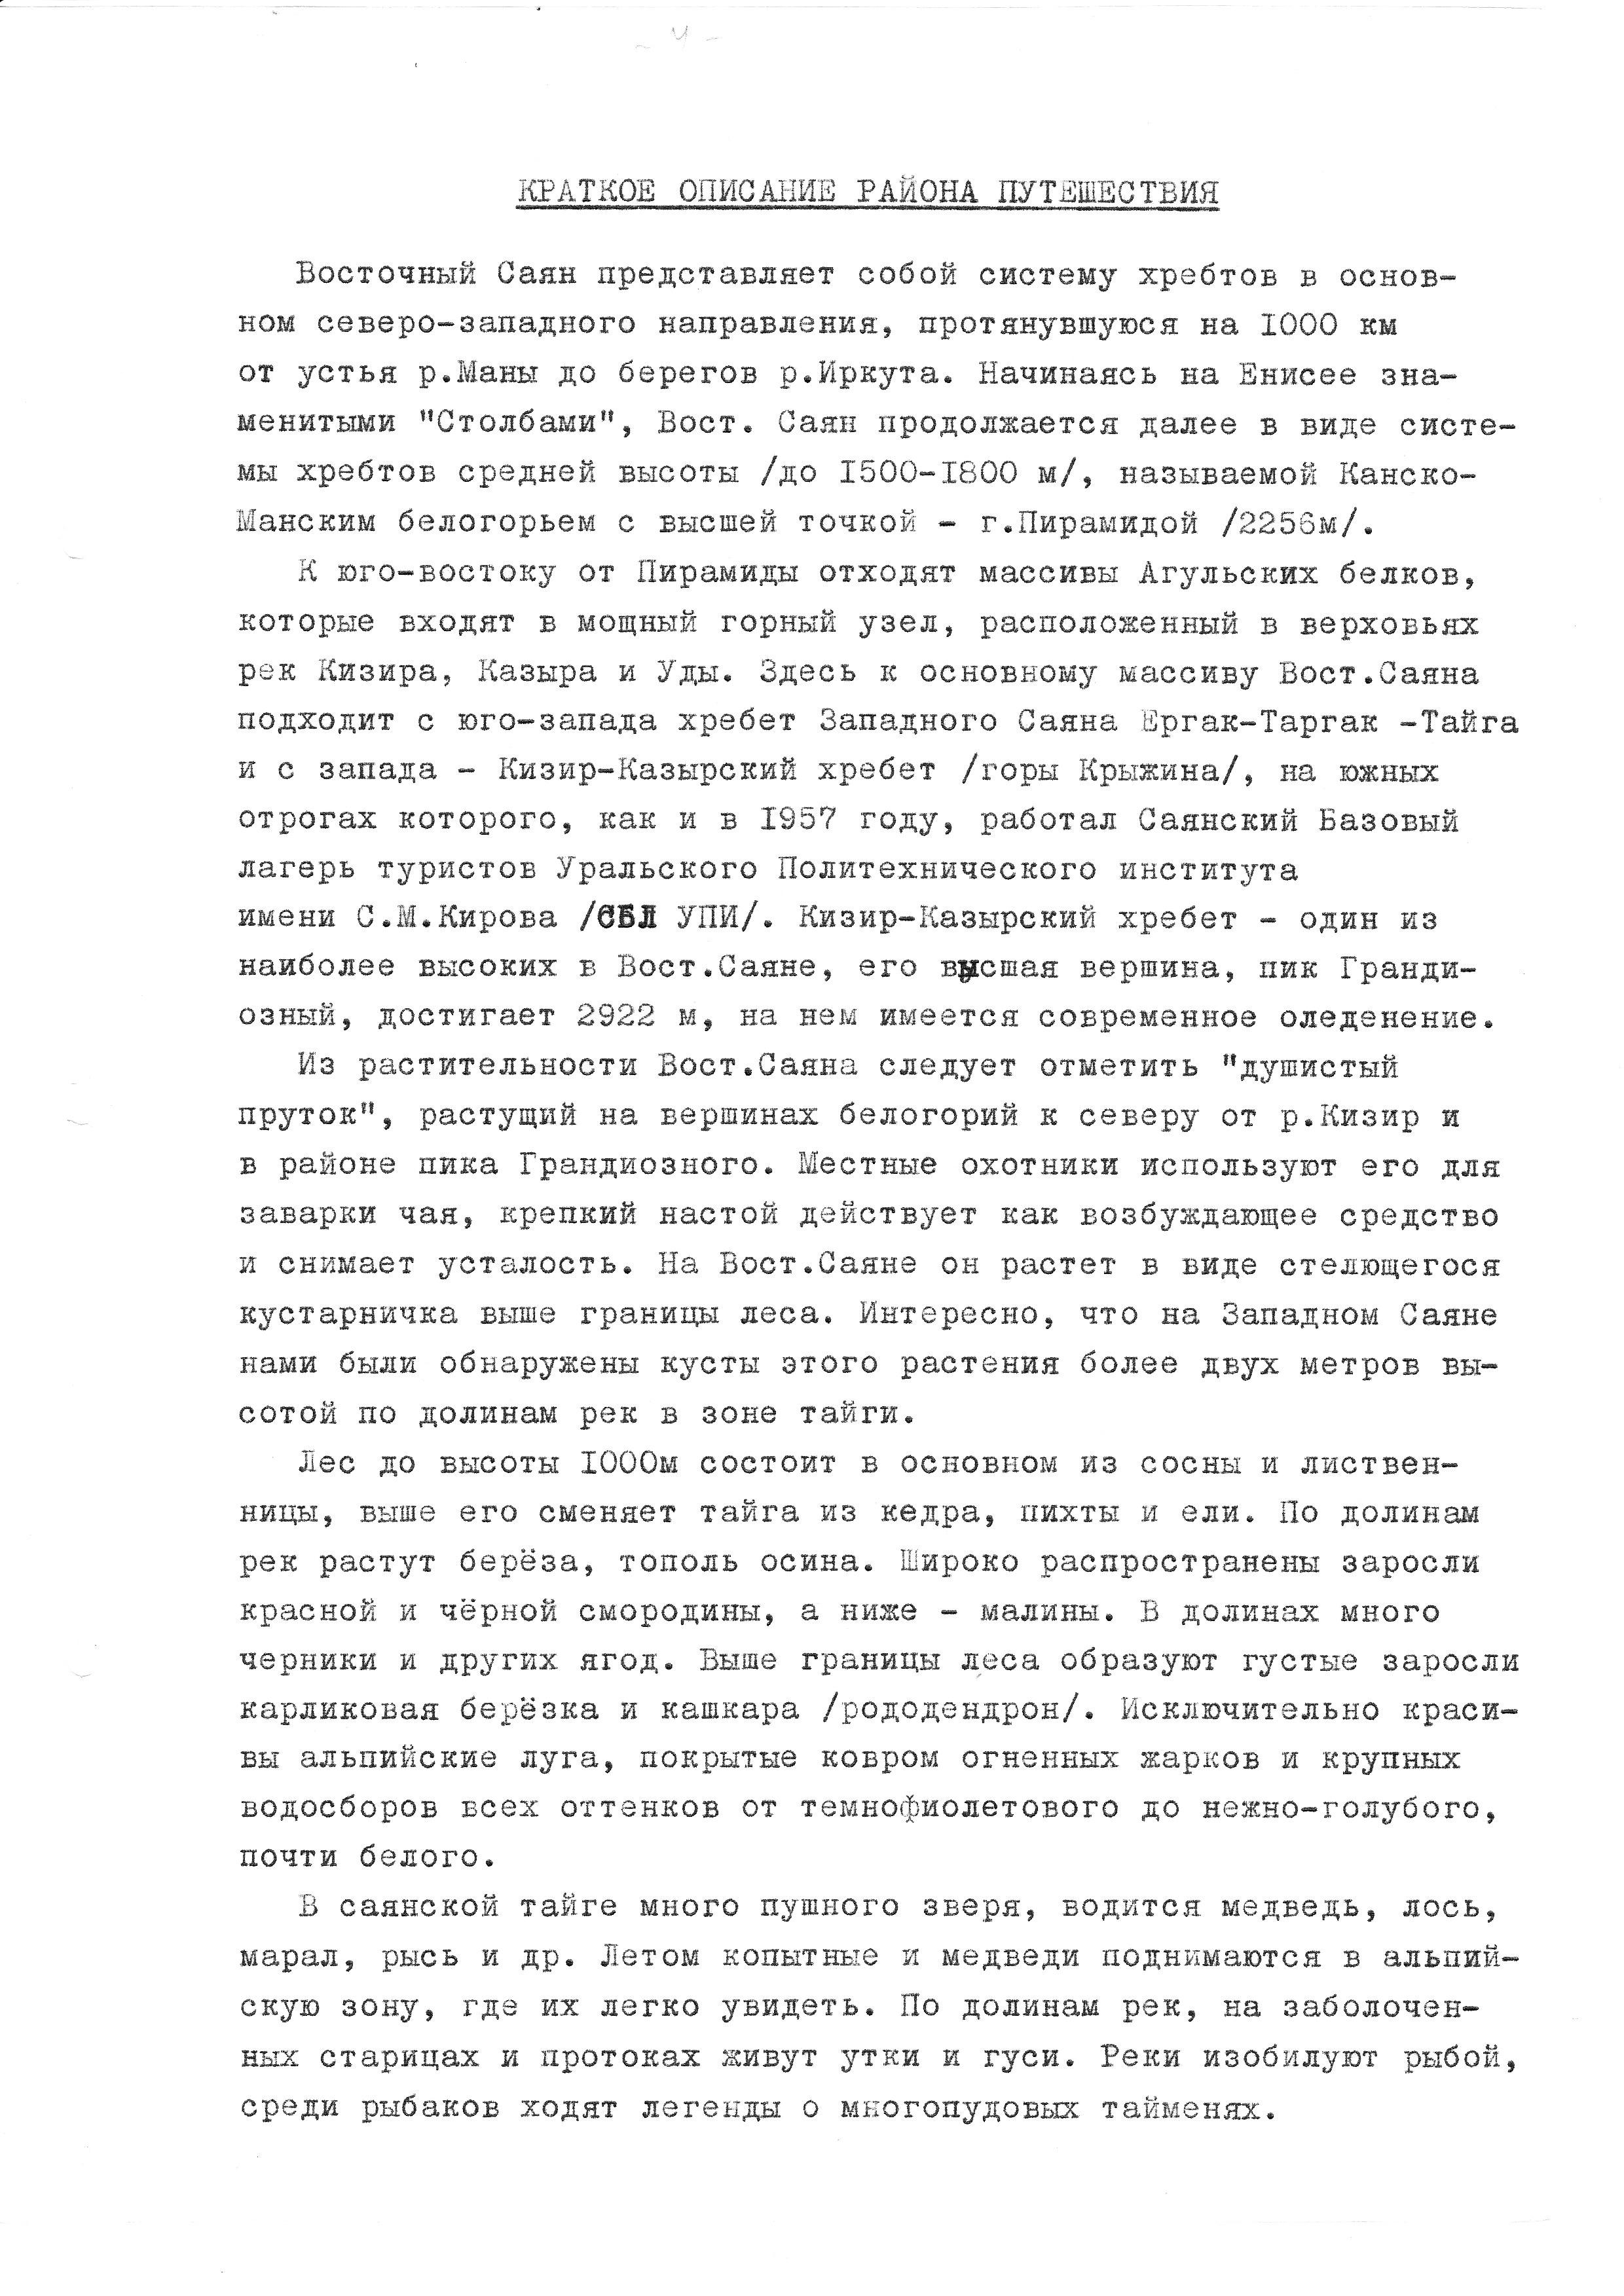 https://img-fotki.yandex.ru/get/6816/164520479.7d/0_e48b2_8a5312ff_orig.jpg